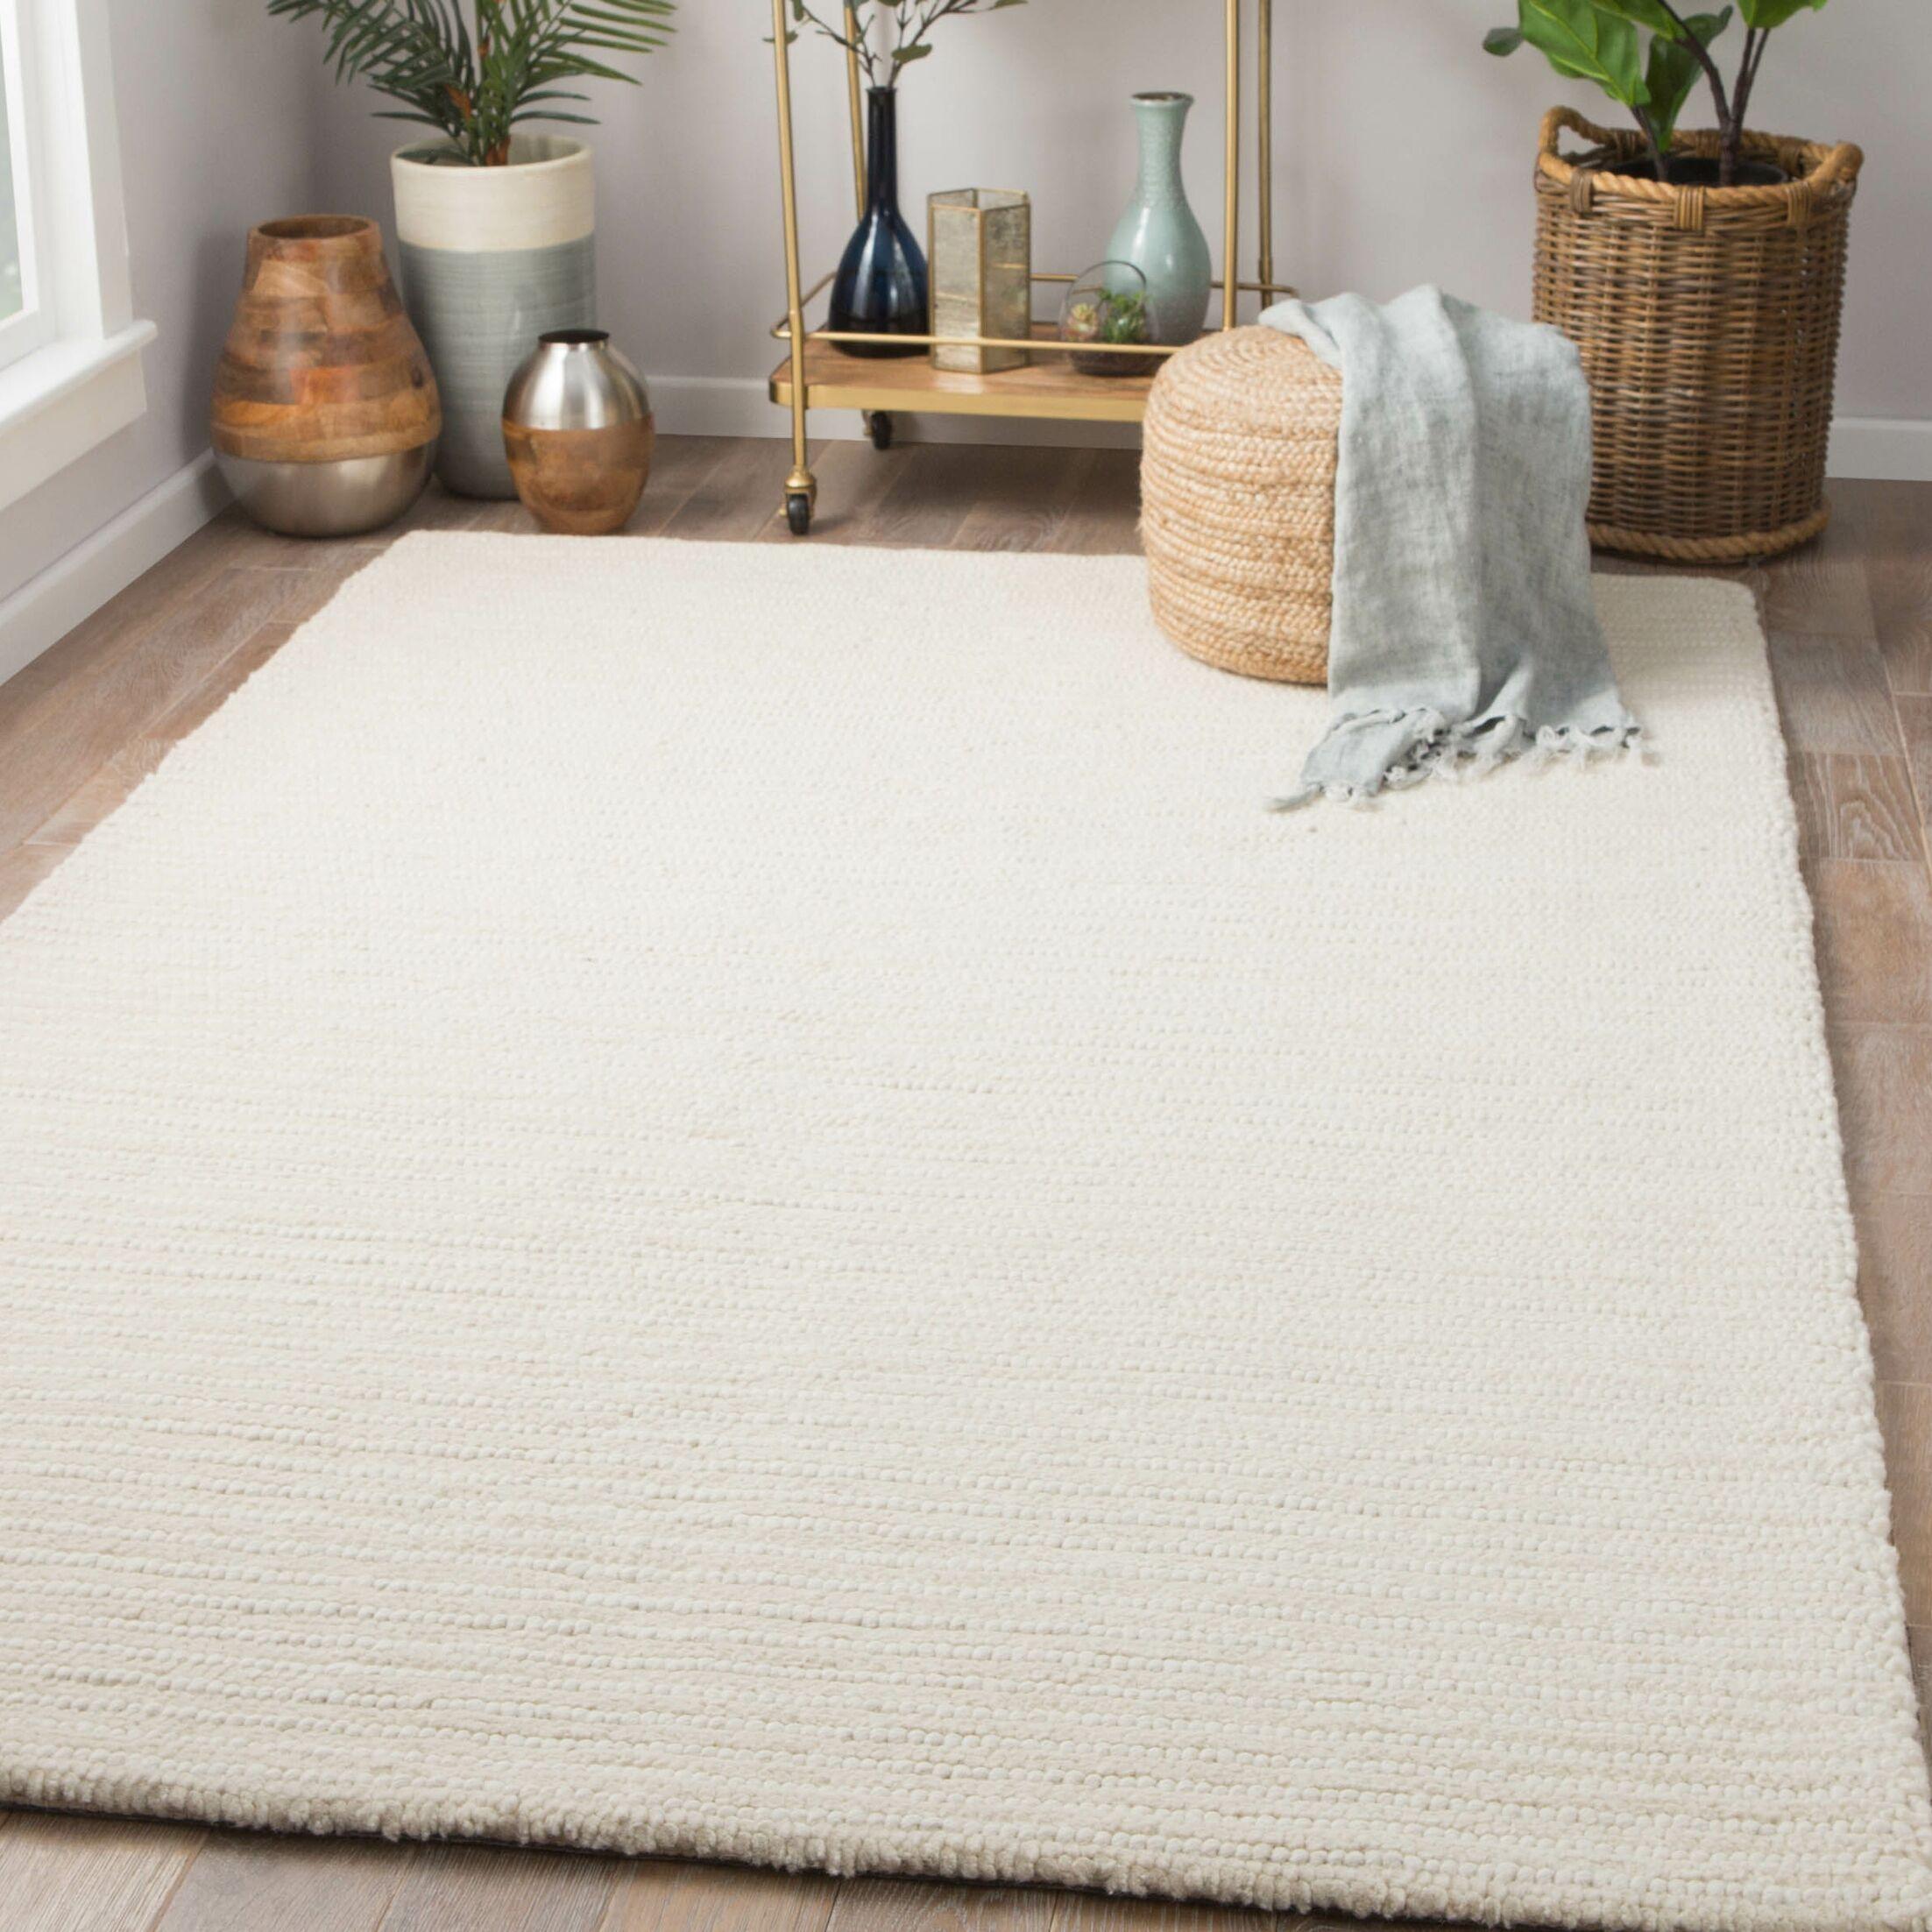 Mahar Hand-Woven Angora/Marshmallow Area Rug Rug Size: Rectangle 8' x 10'